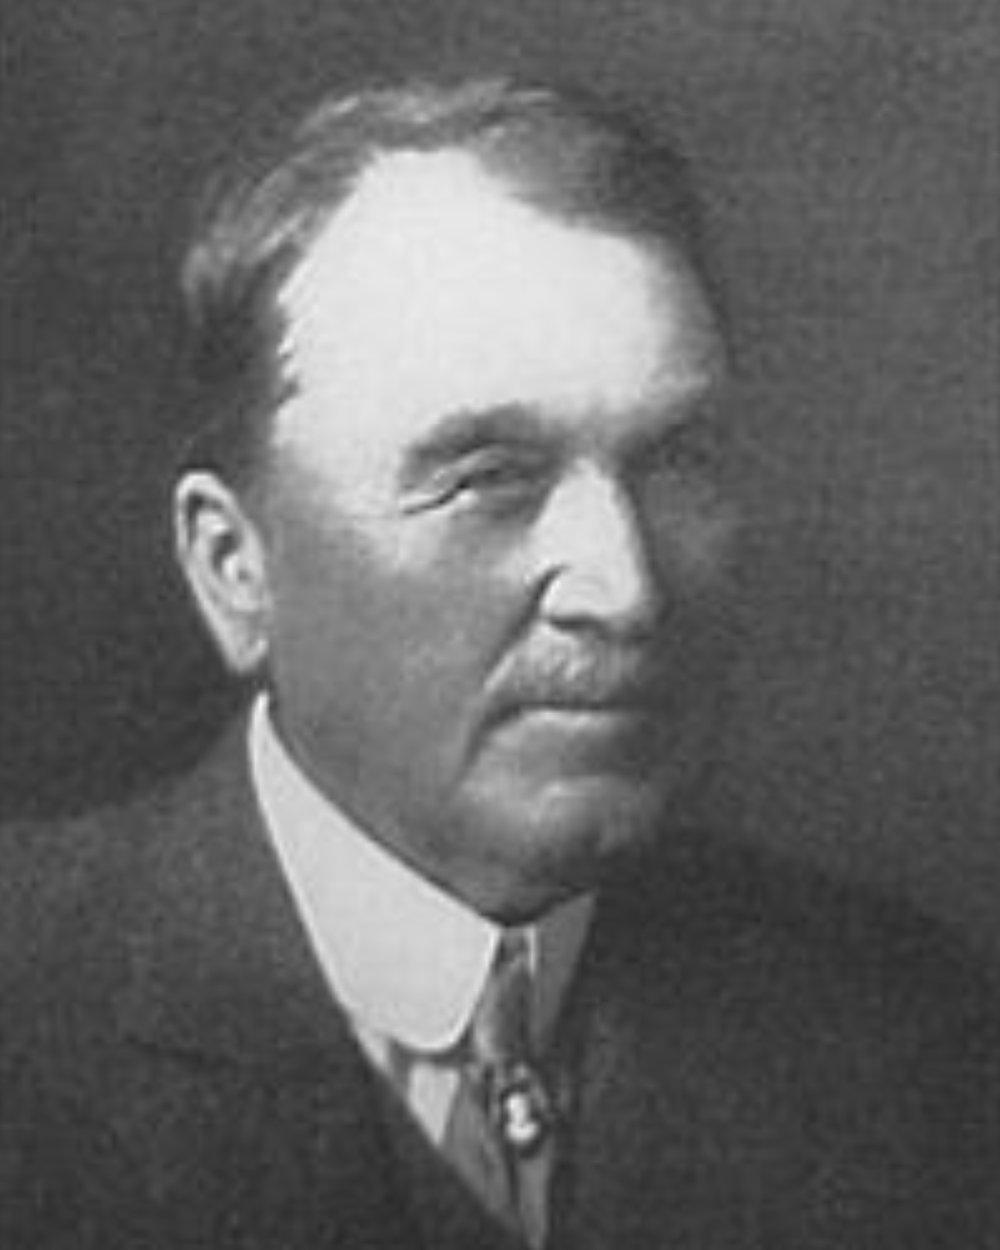 ROBERT H. HAZLETT